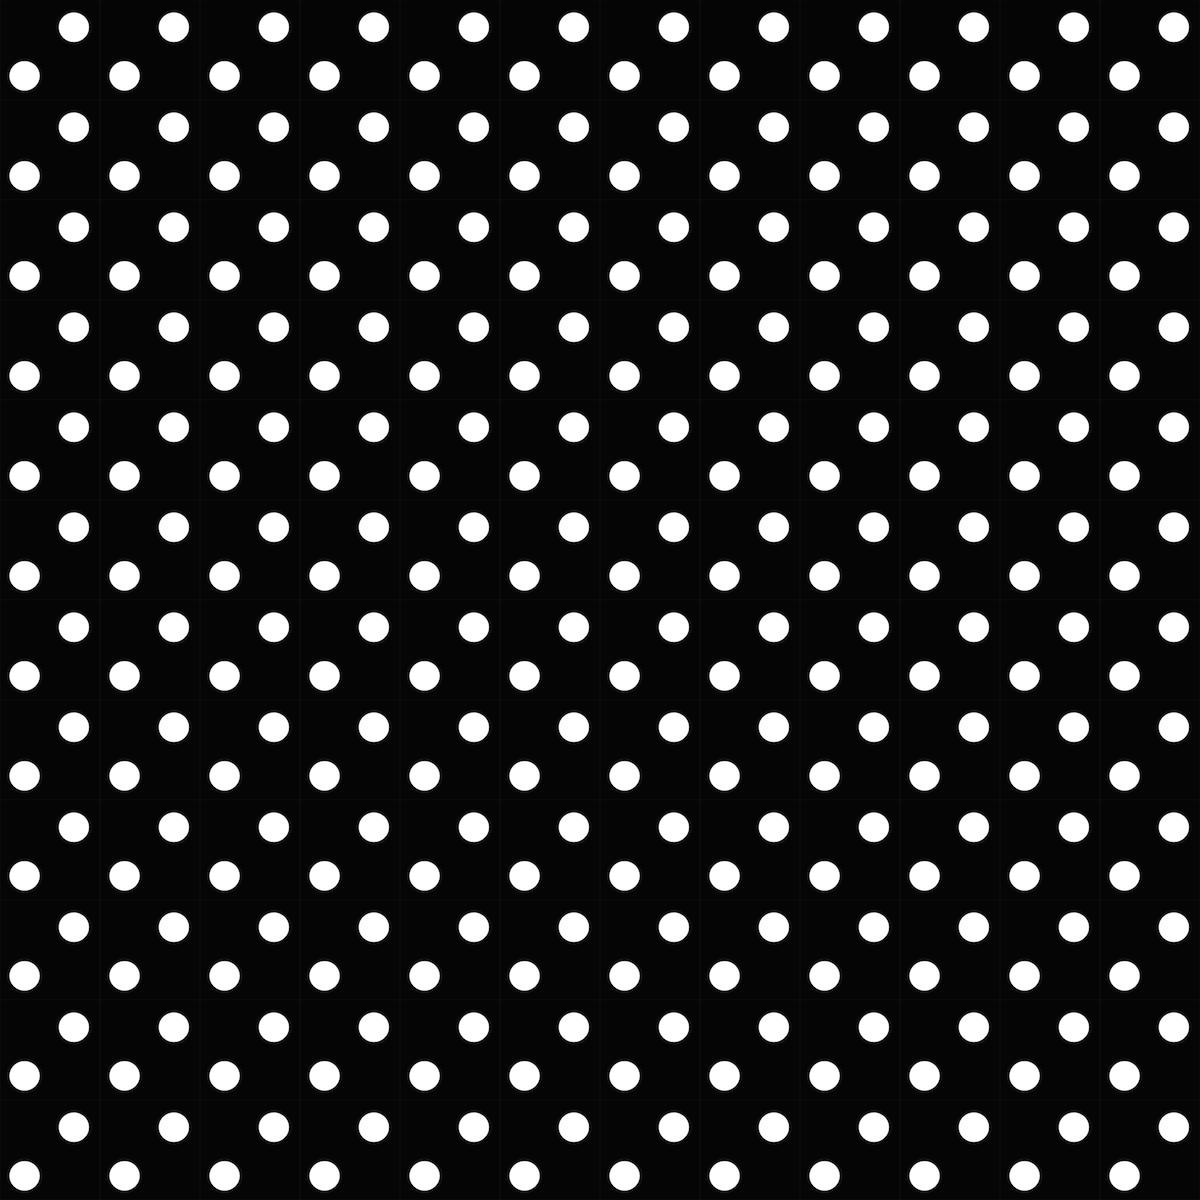 Kootation Com Polka Dots Wallpaper Polka Dot Background White Scrapbook